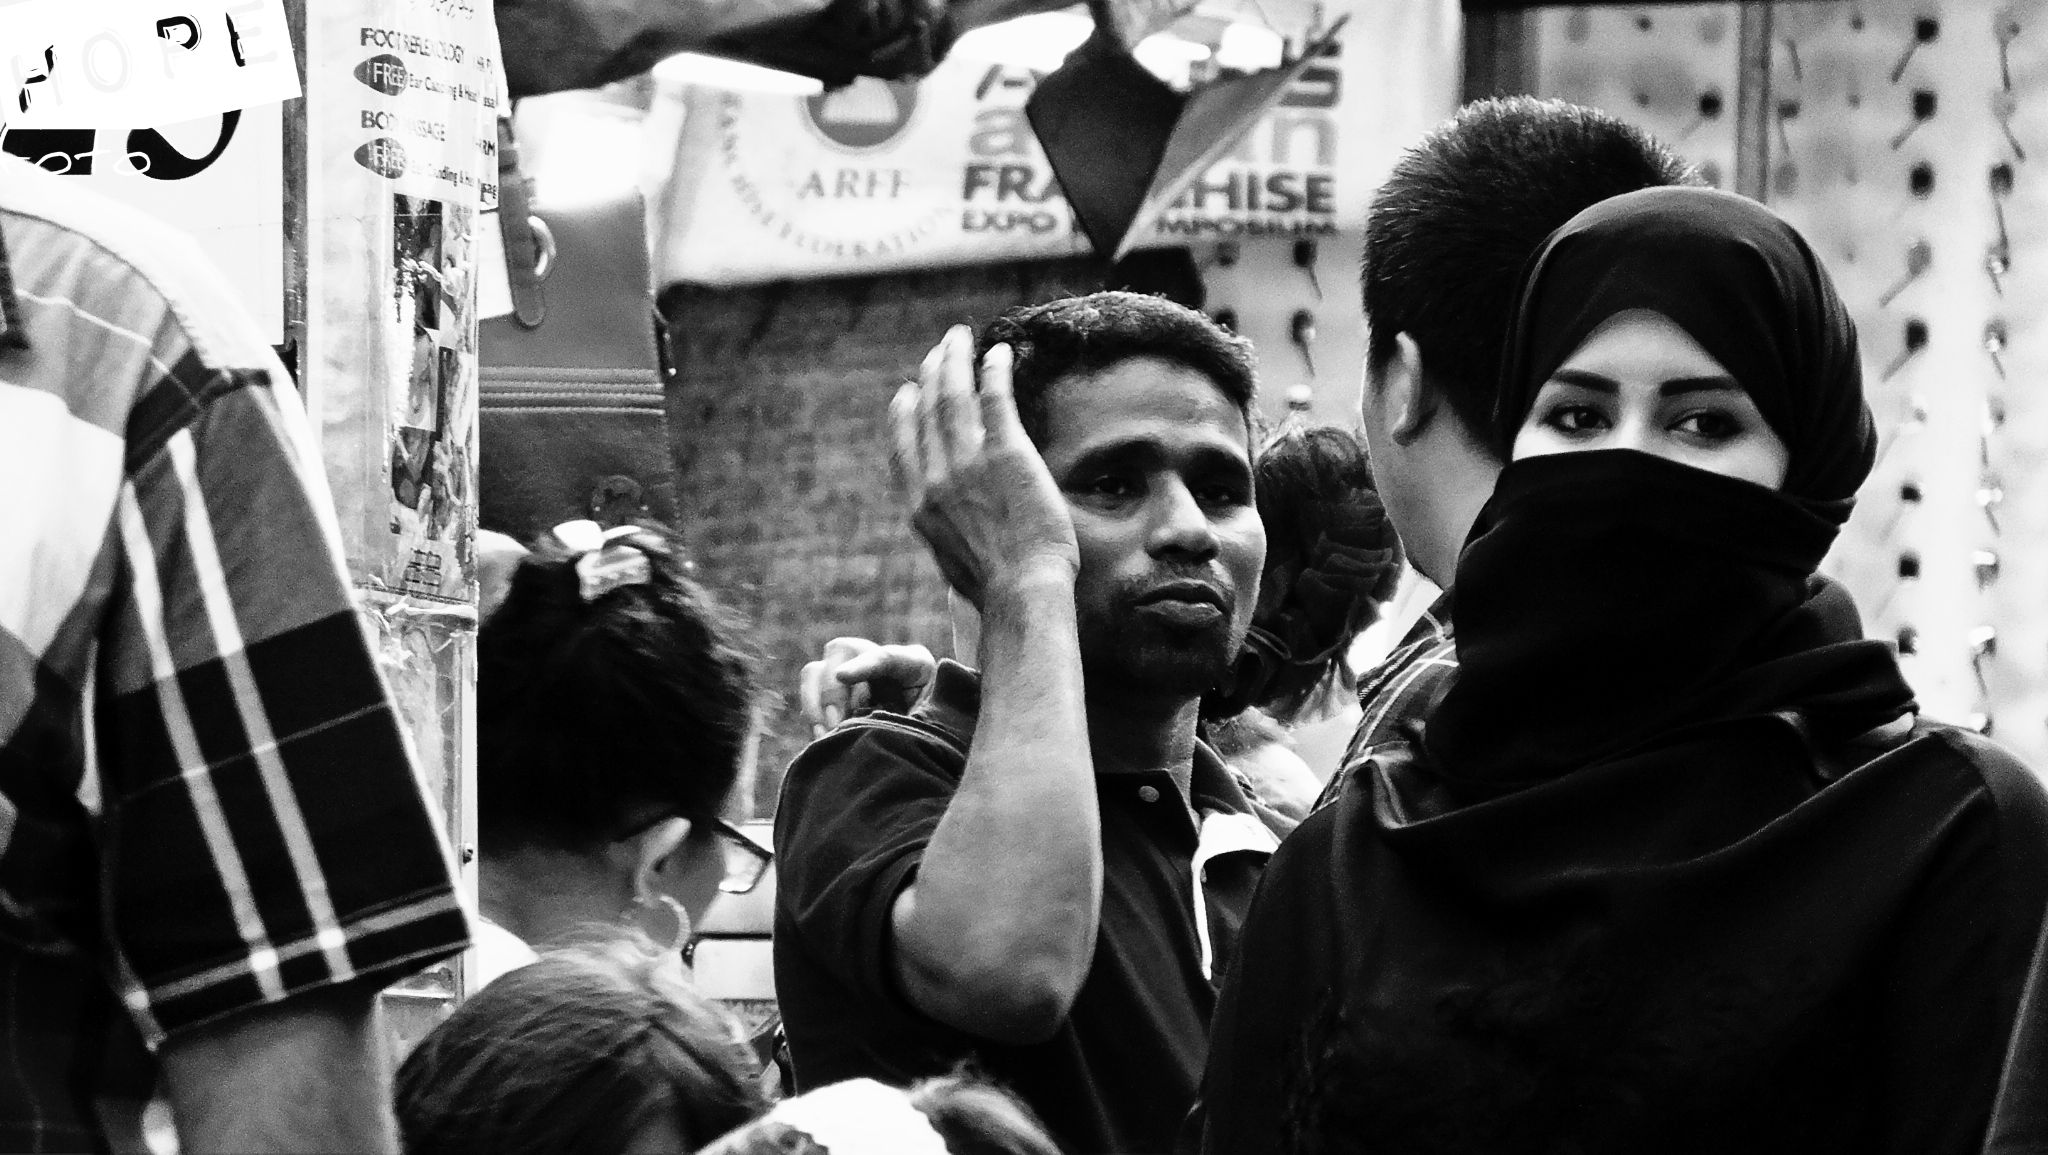 Eyes by Azhar Isl